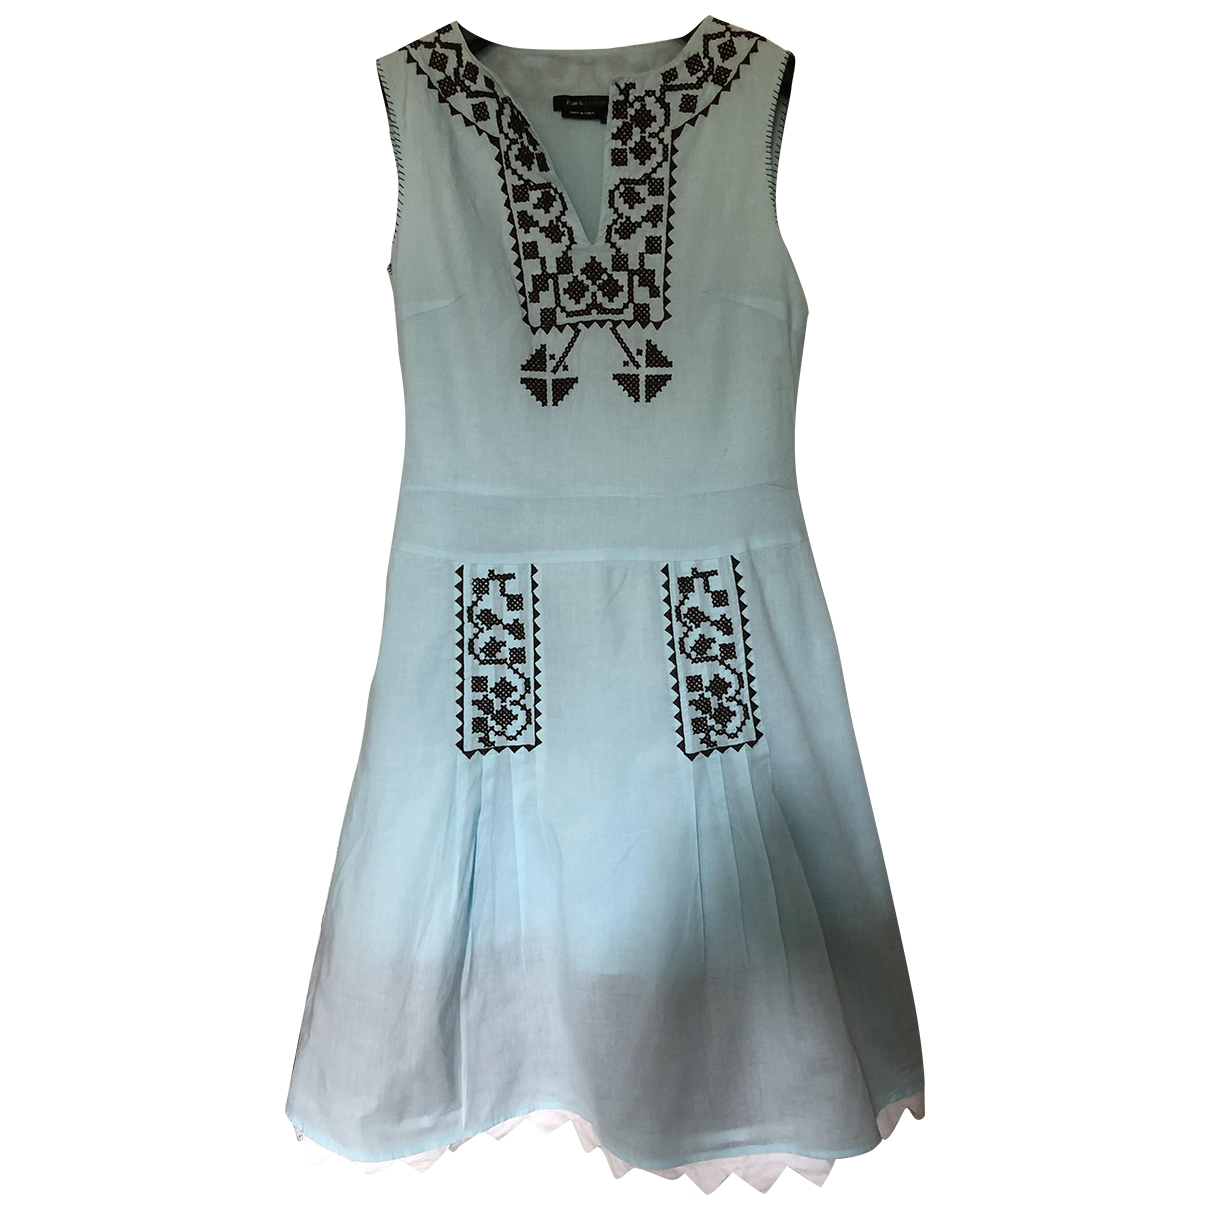 Bcbg Max Azria \N Cotton dress for Women 38 IT